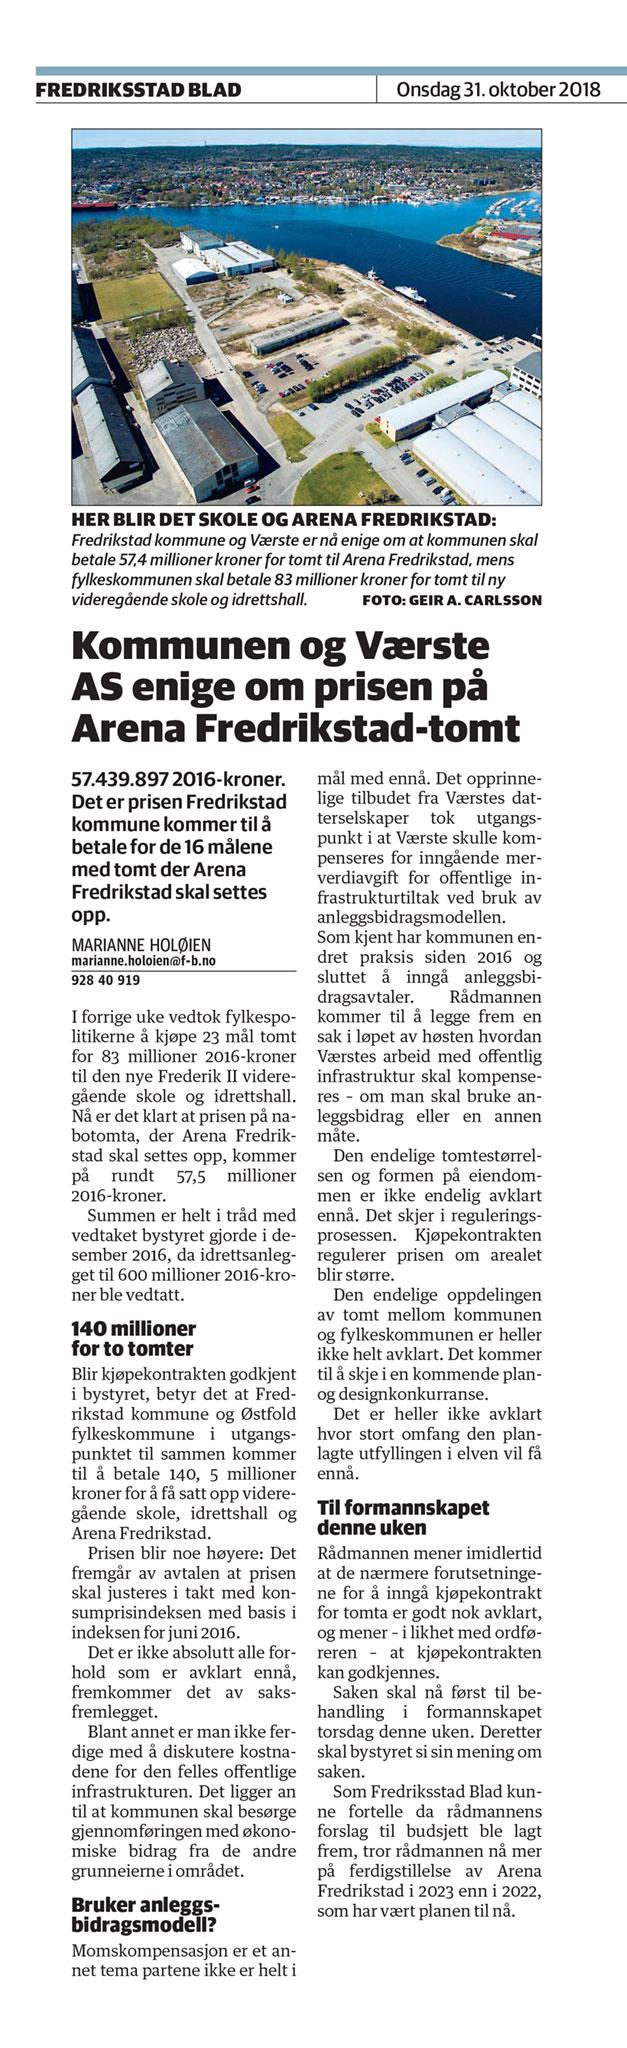 2018-10-31-FB-Kommunen-og-Værste-enige-om-prisen-på-Arena-Fredrikstad-tomt.jpg